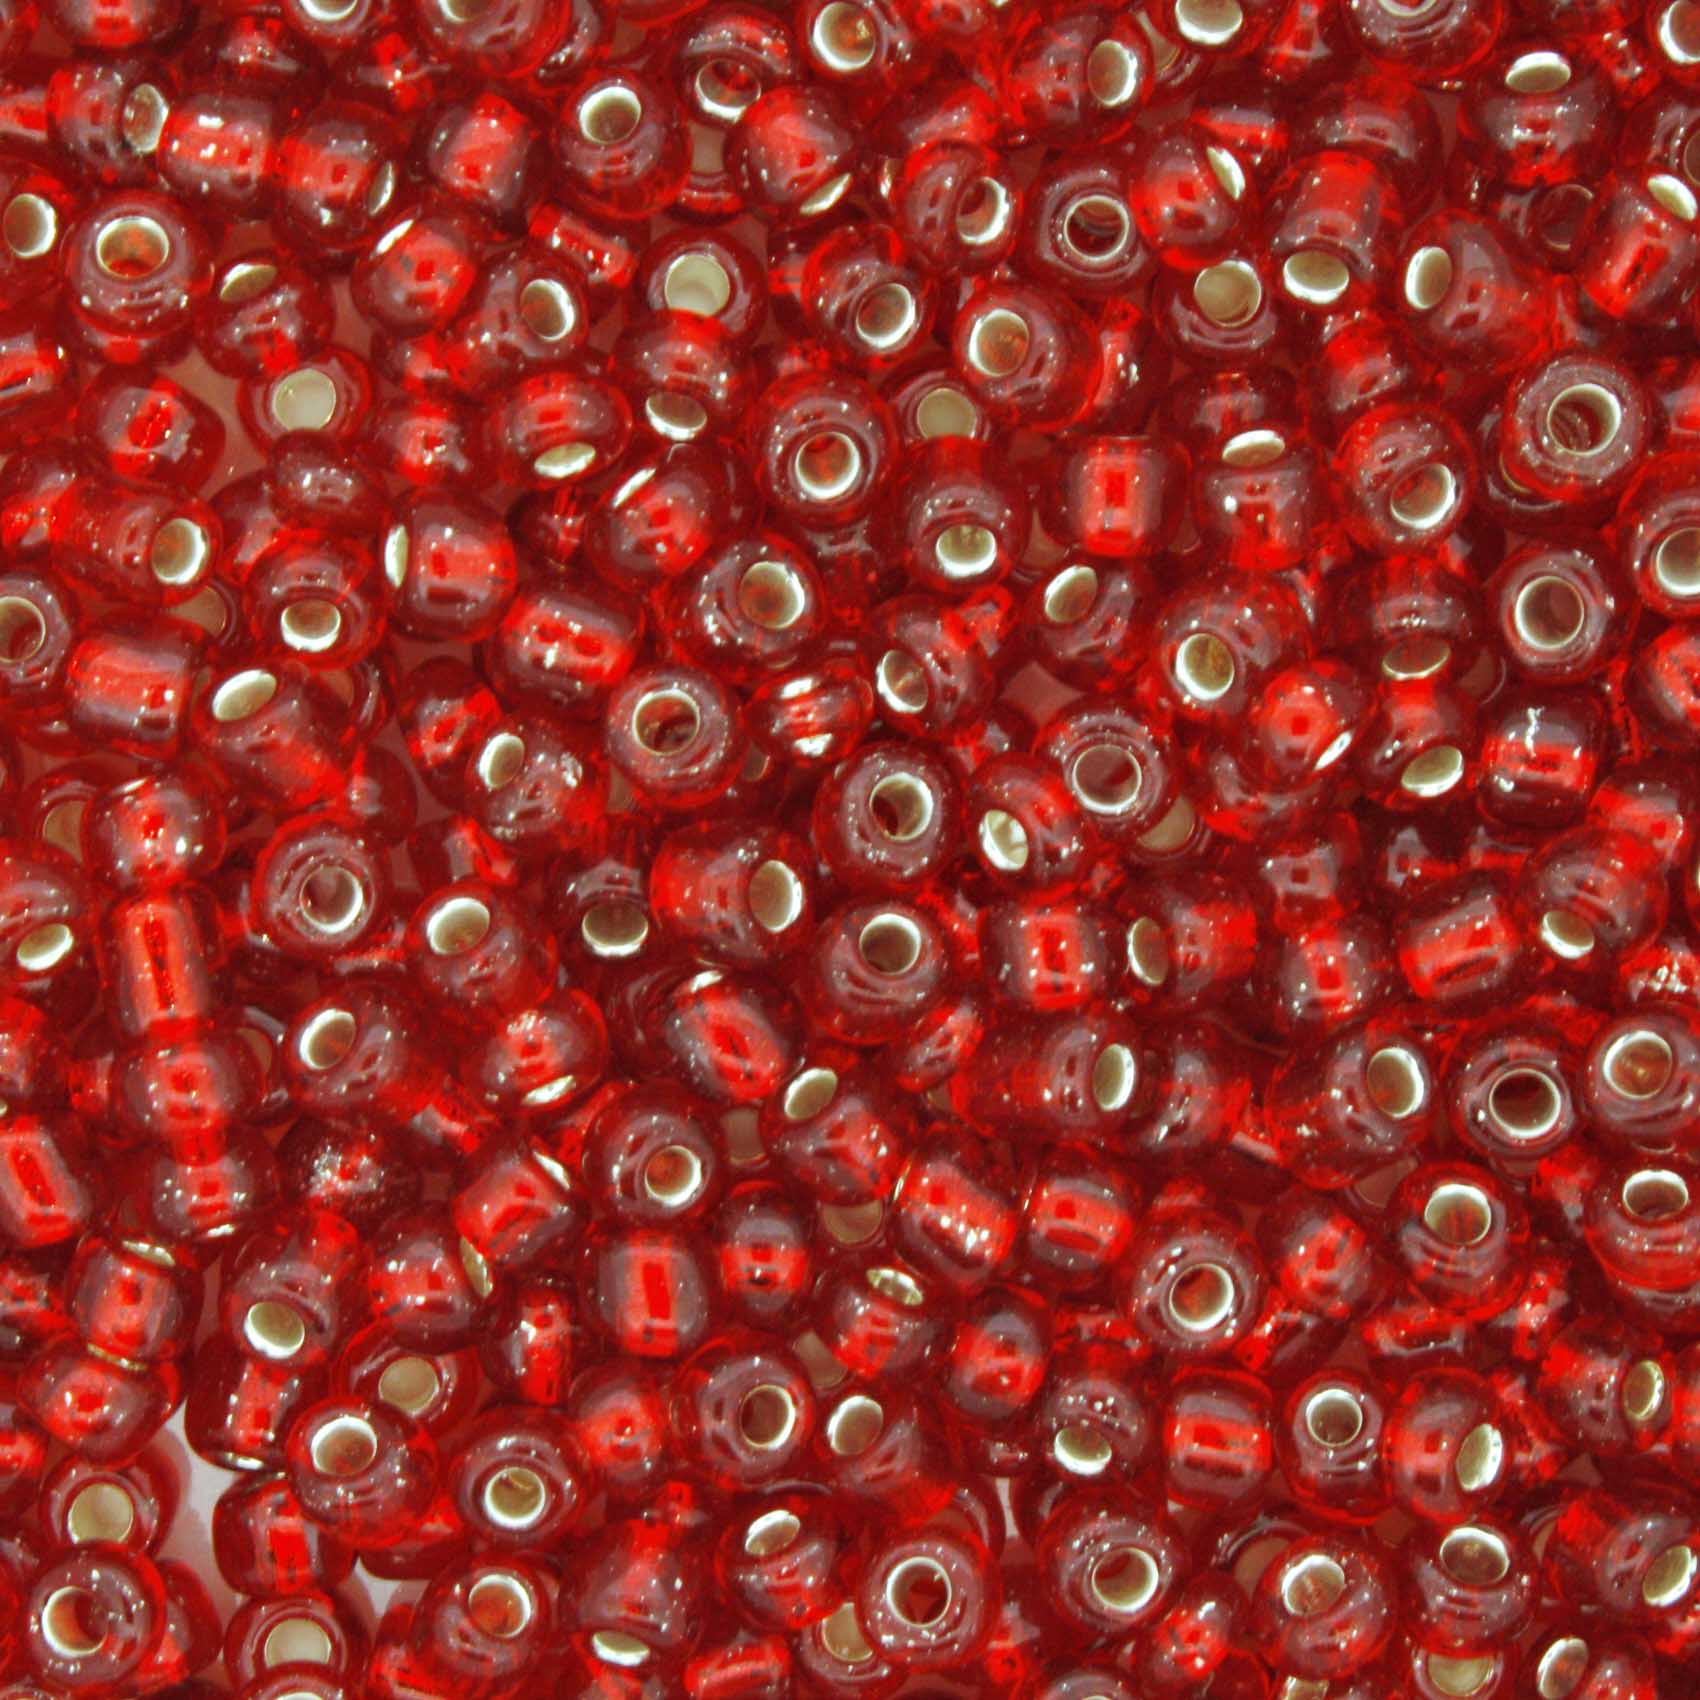 Miçanga - Vemelha Transparente - 6/0 [4x3mm]  - Stéphanie Bijoux® - Peças para Bijuterias e Artesanato